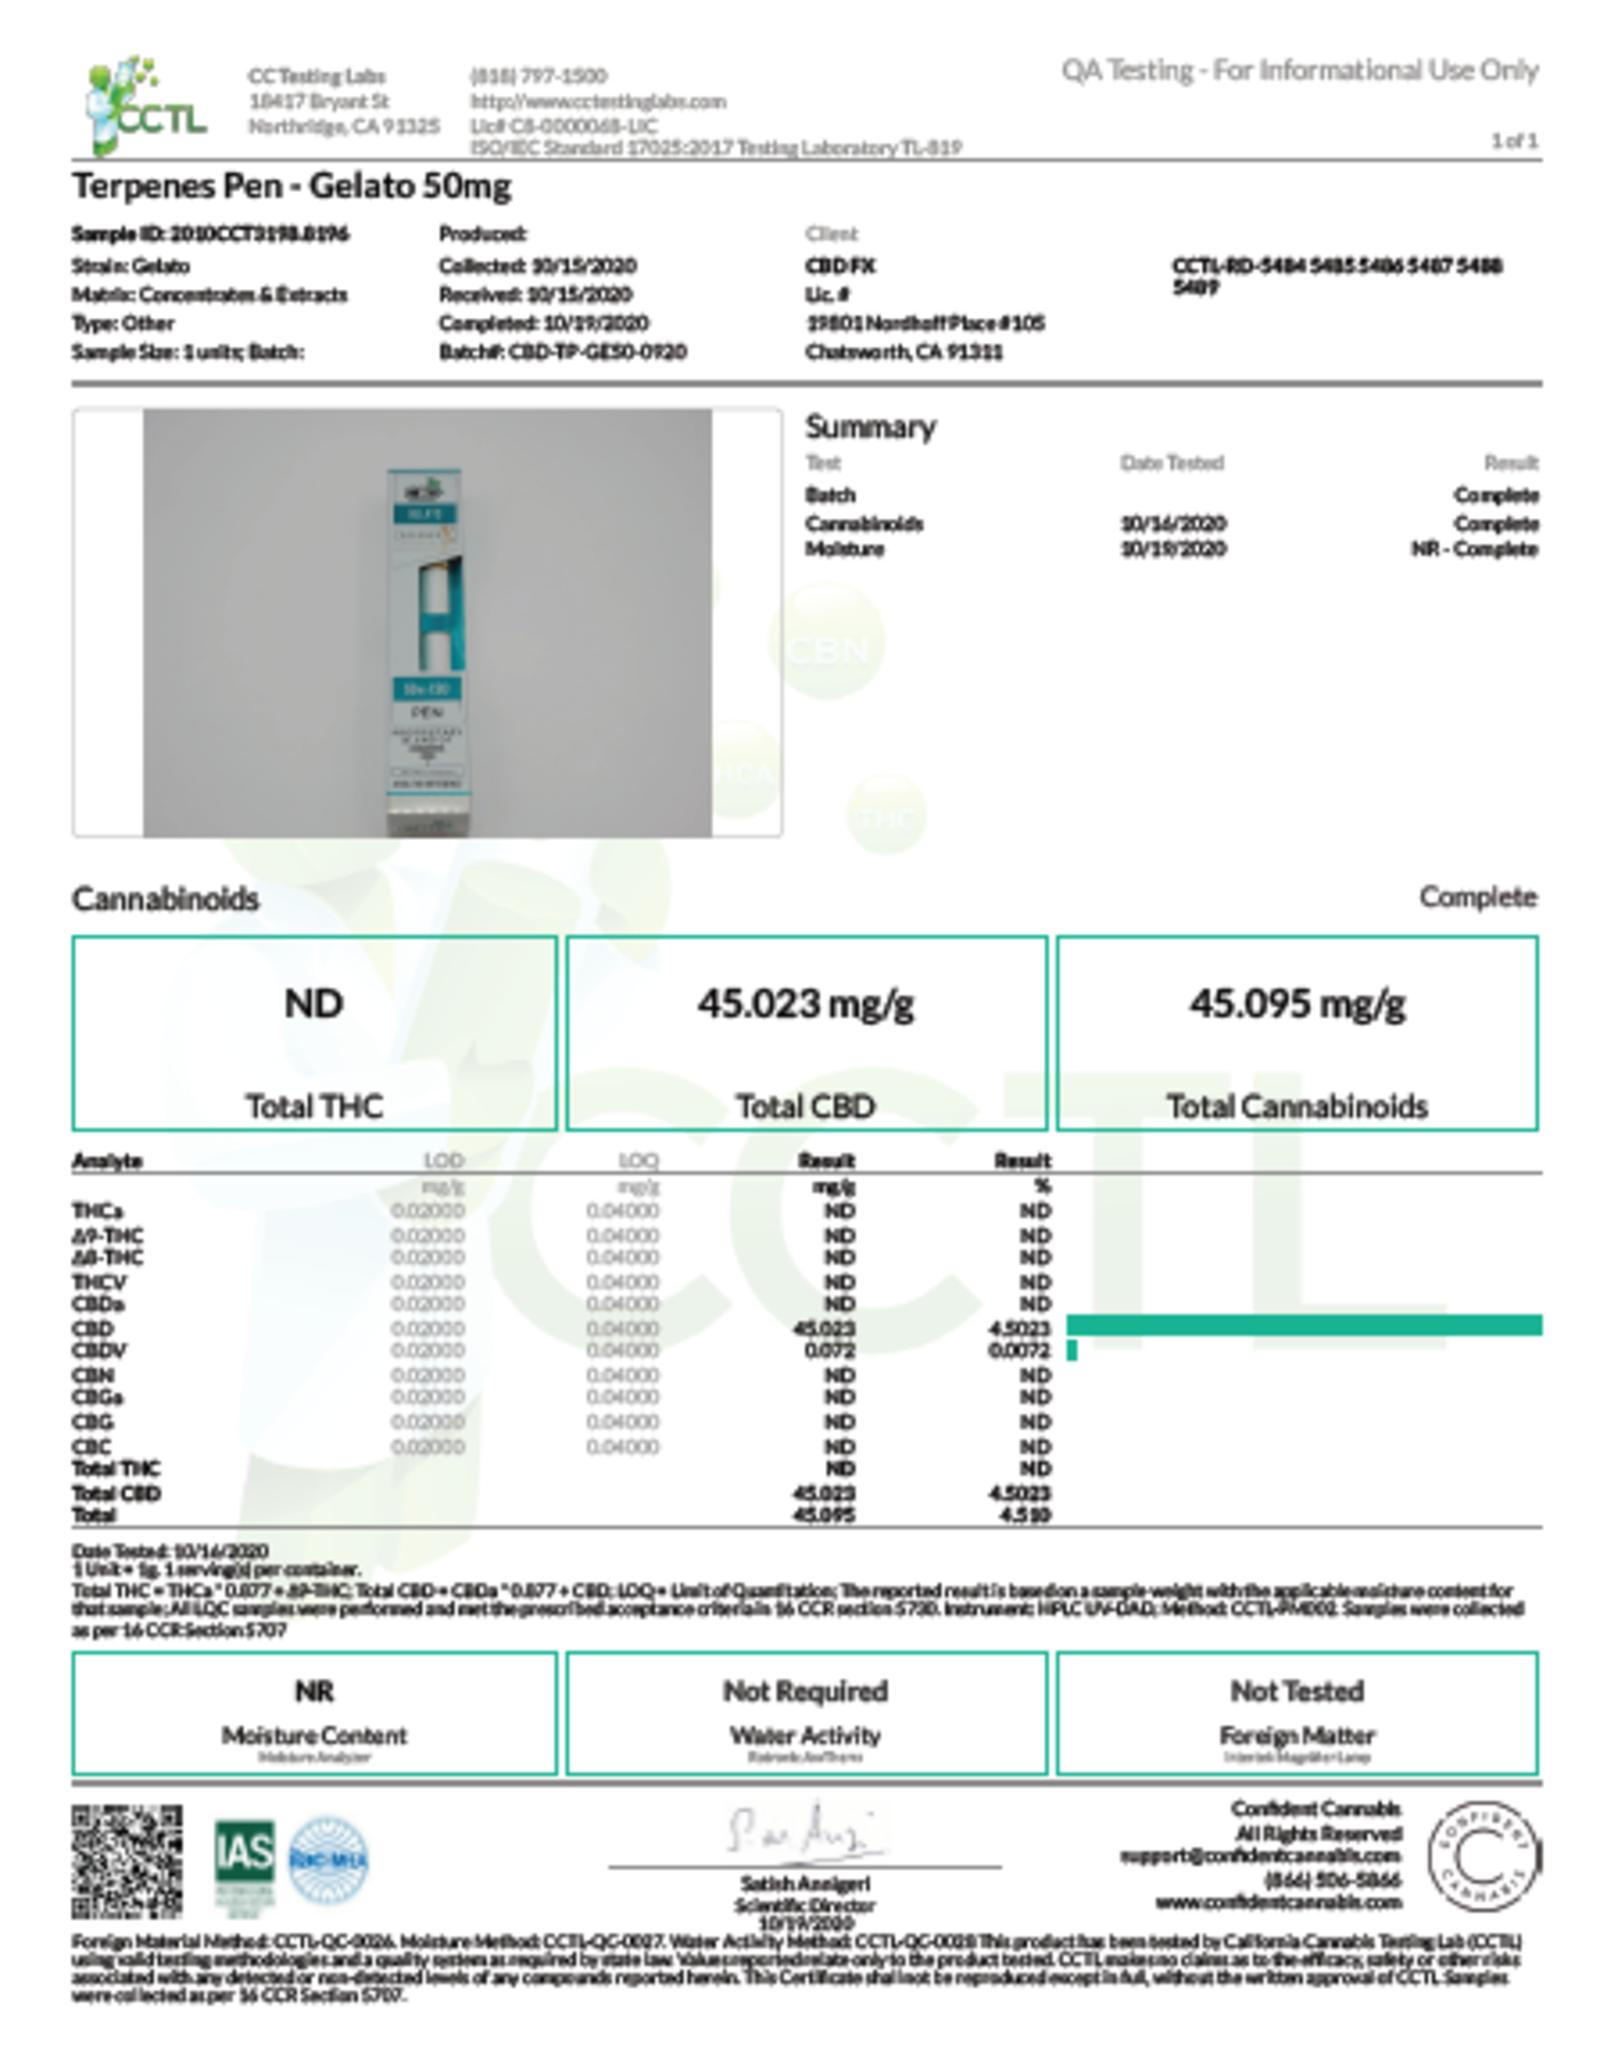 CBD + Terpenes 50mg Disposable Vape Pen, Gelato